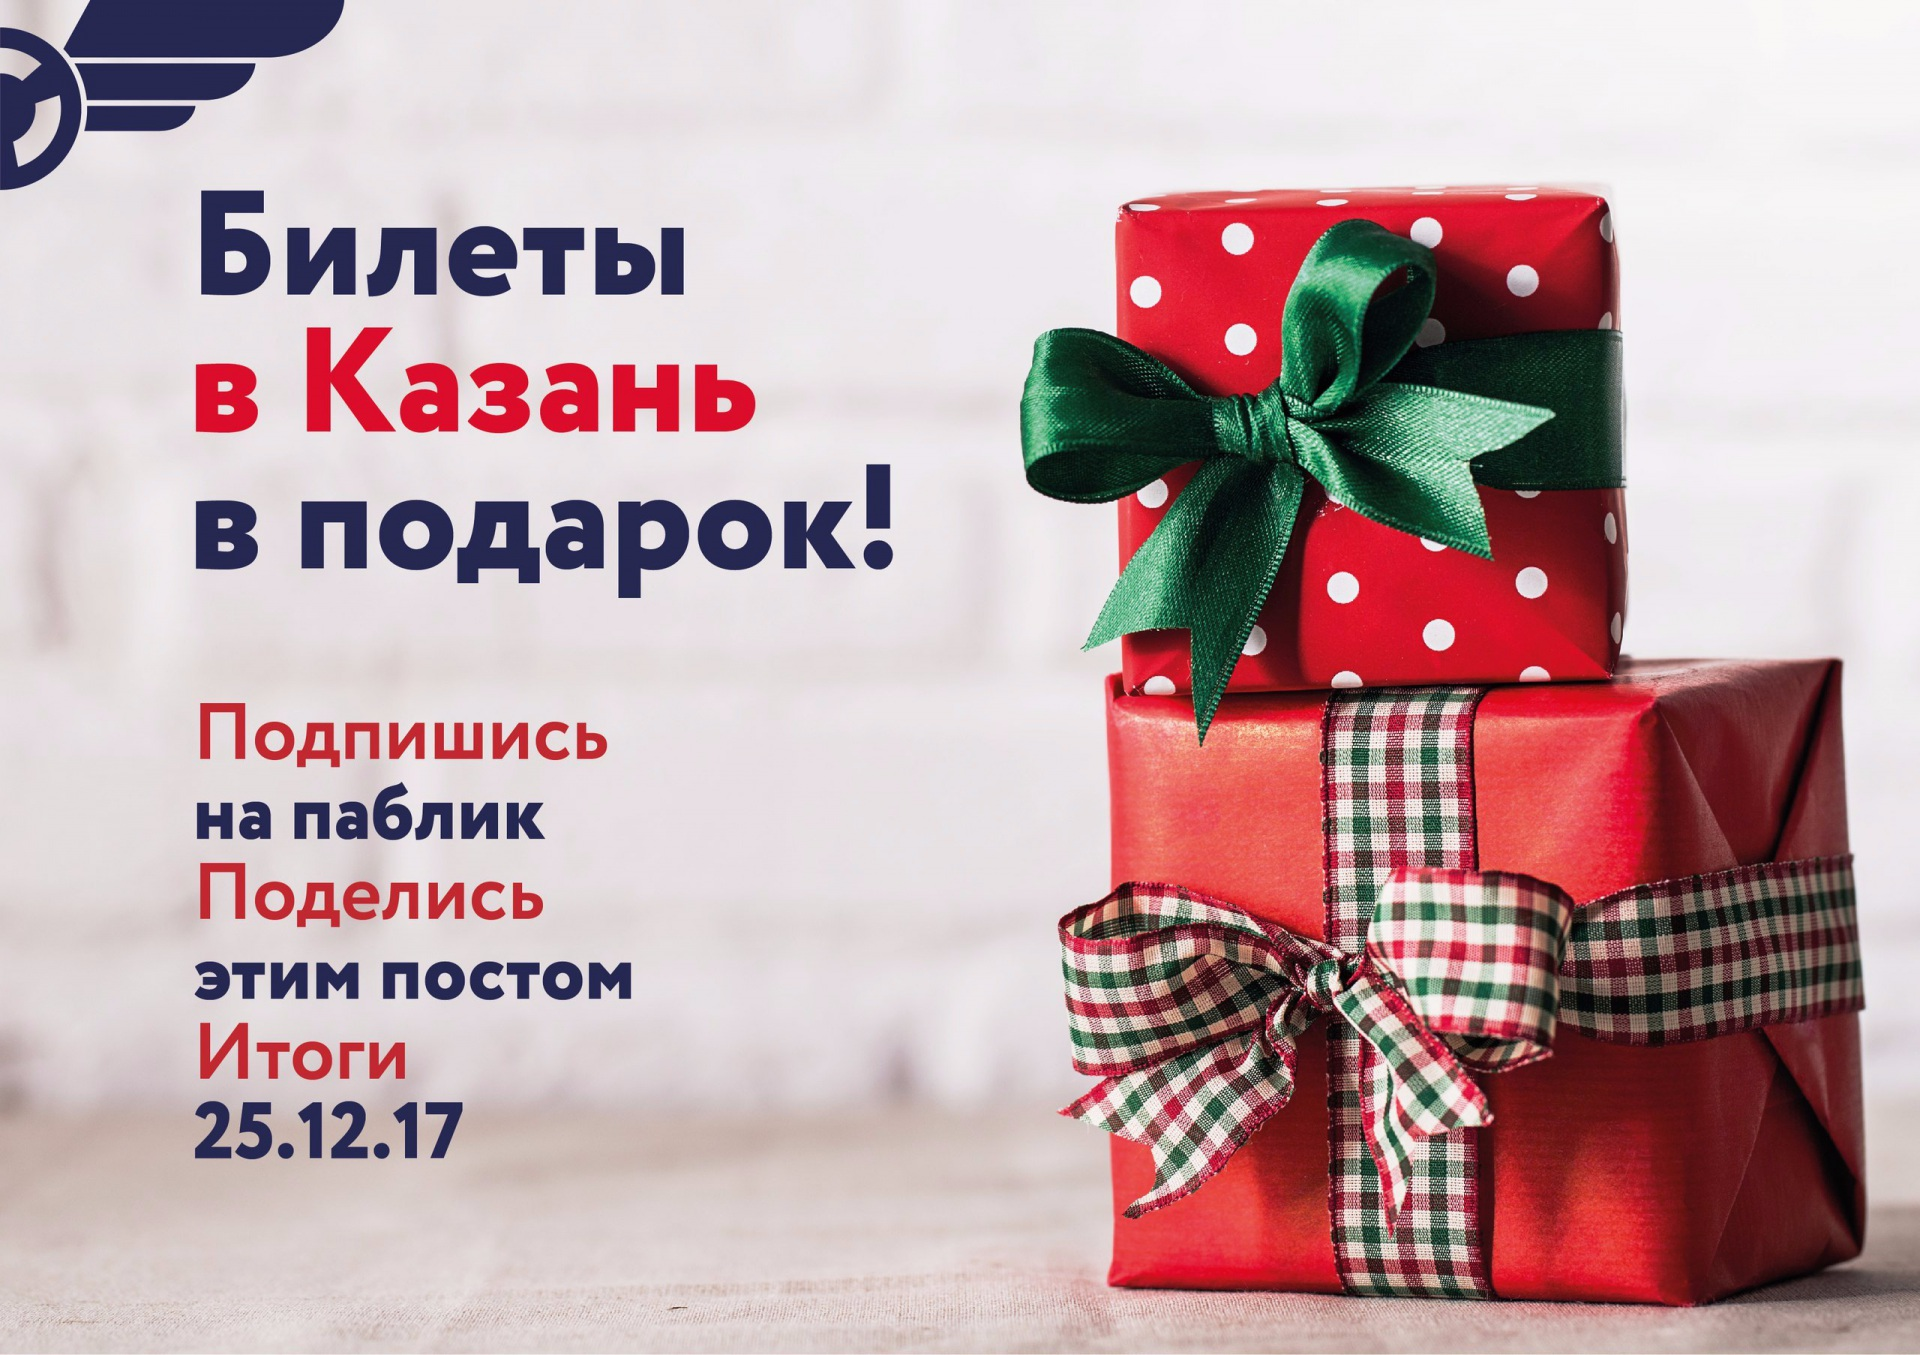 Konkurs-repostov_Kazan.jpg